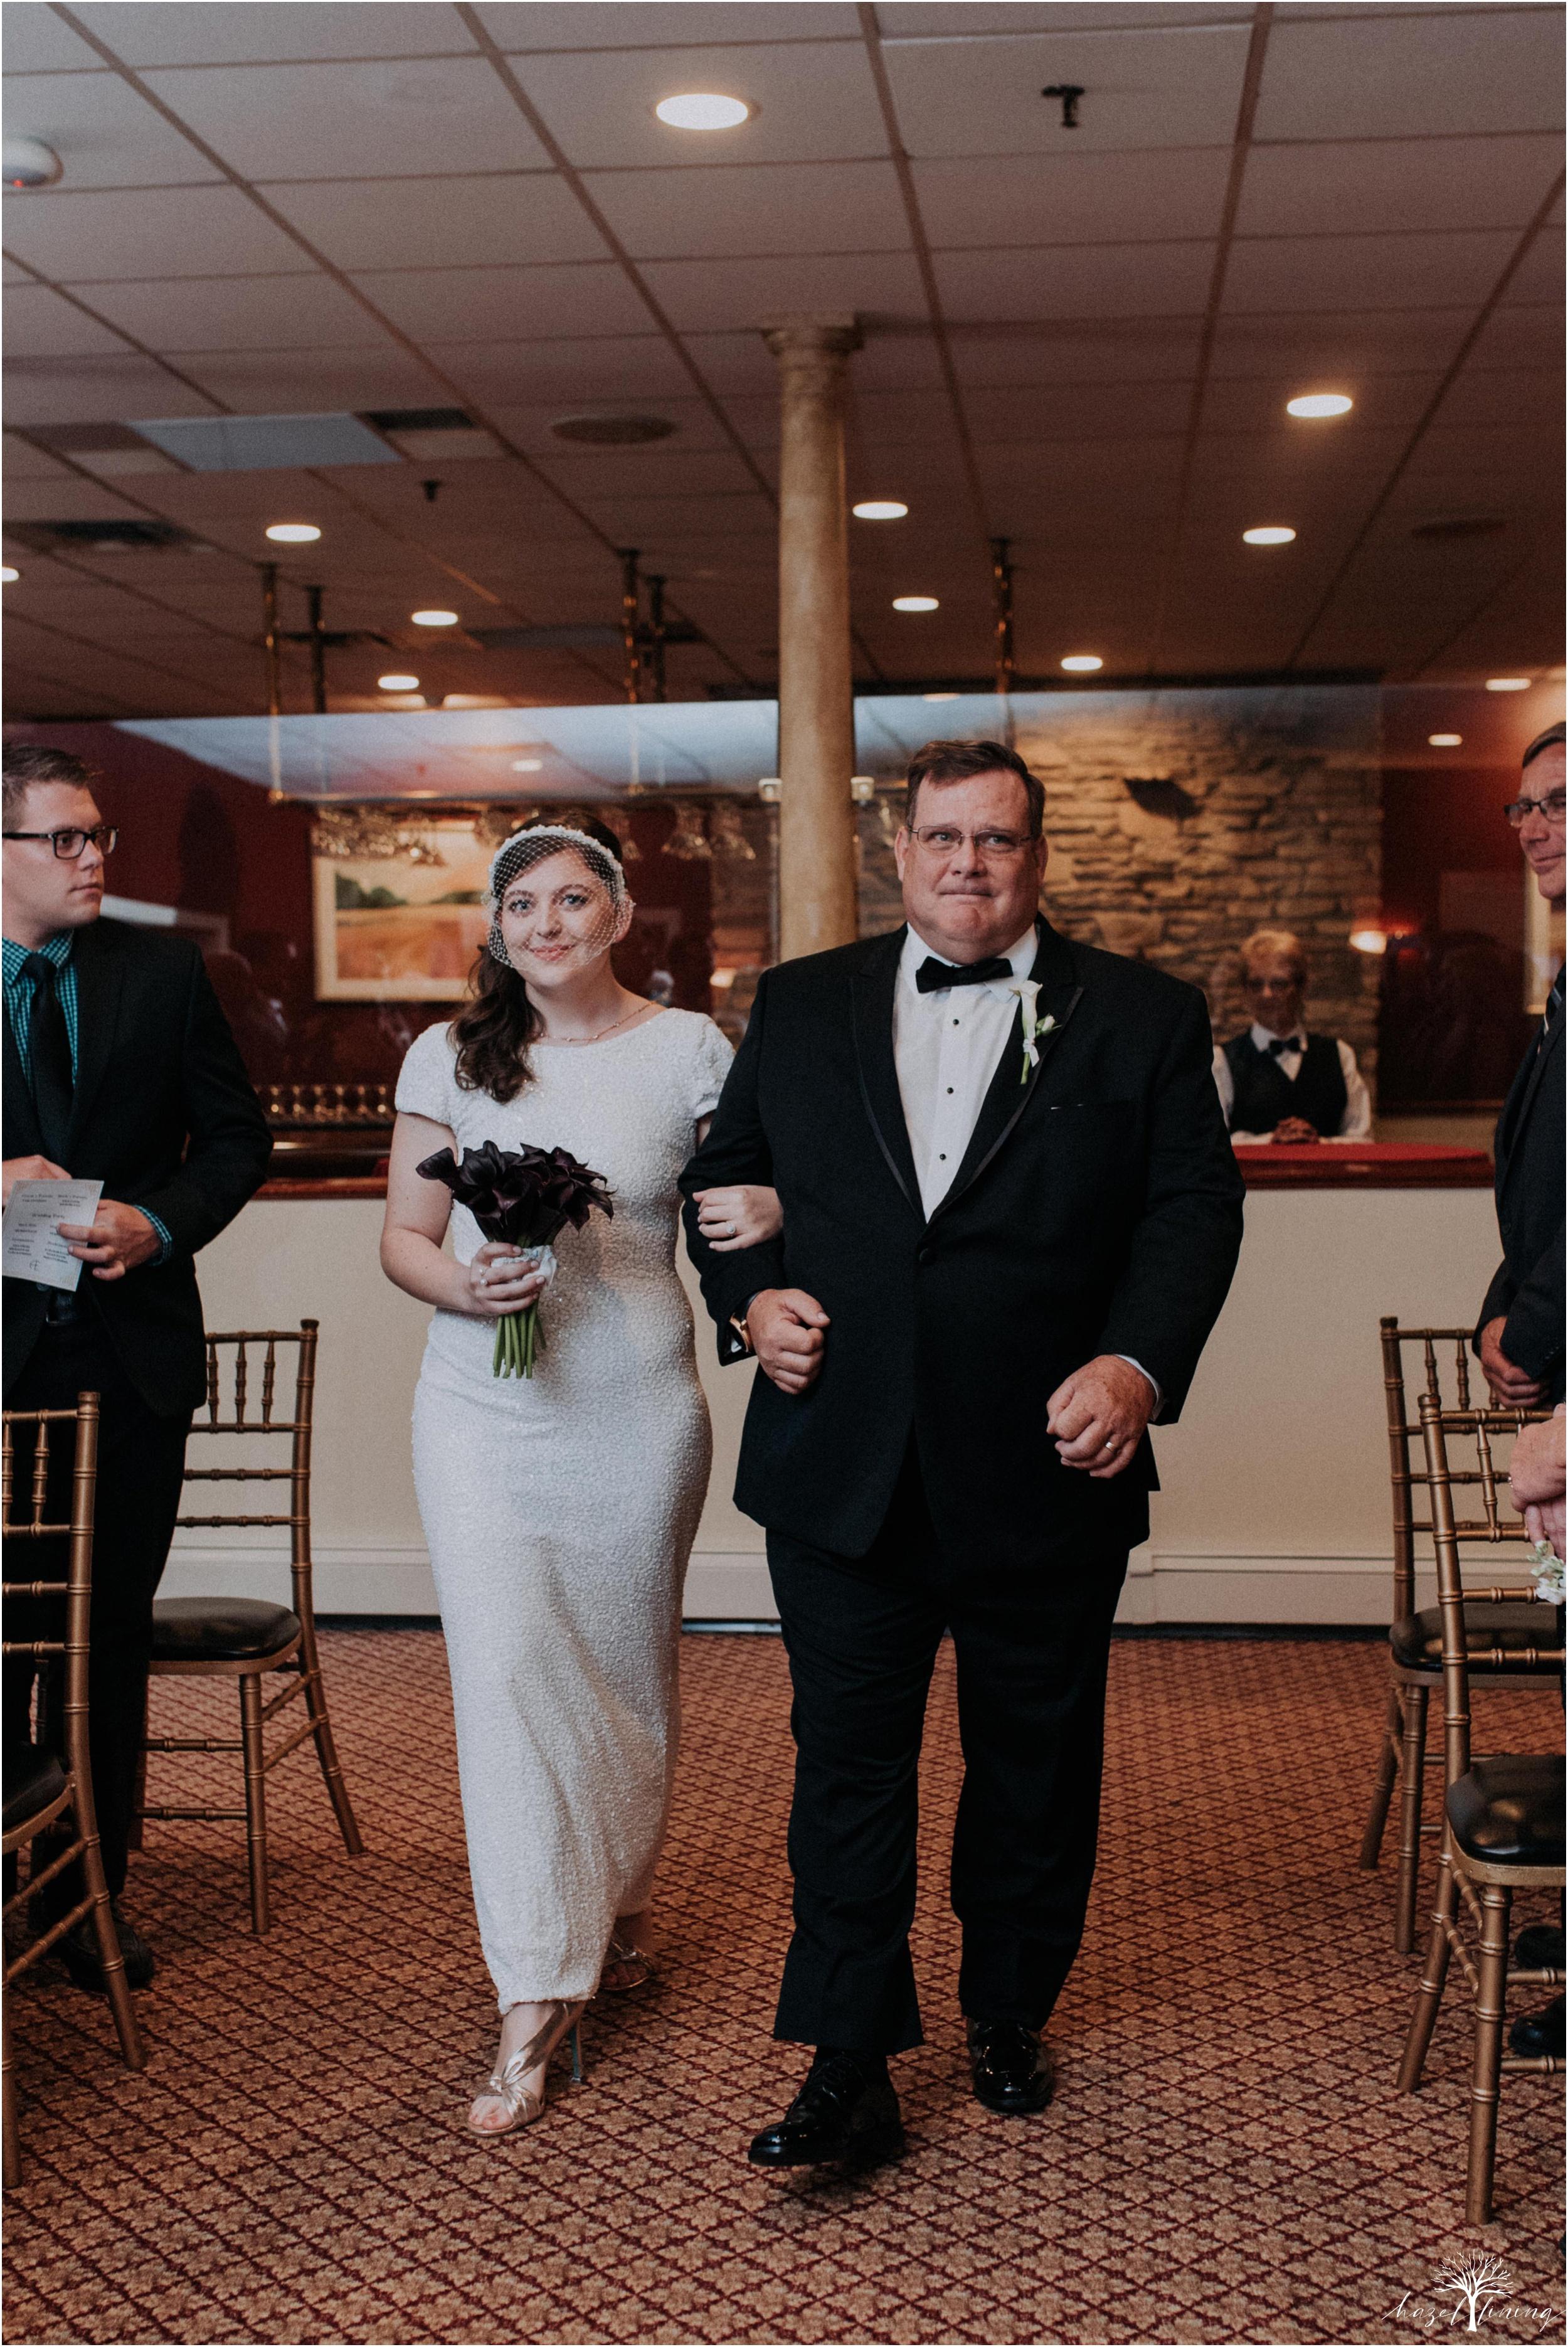 elizabeth-doelp-andrew-foreback-middletown-country-club-summer-langhorne-pennsylvania-wedding-hazel-lining-travel-wedding-elopement-photography_0109.jpg